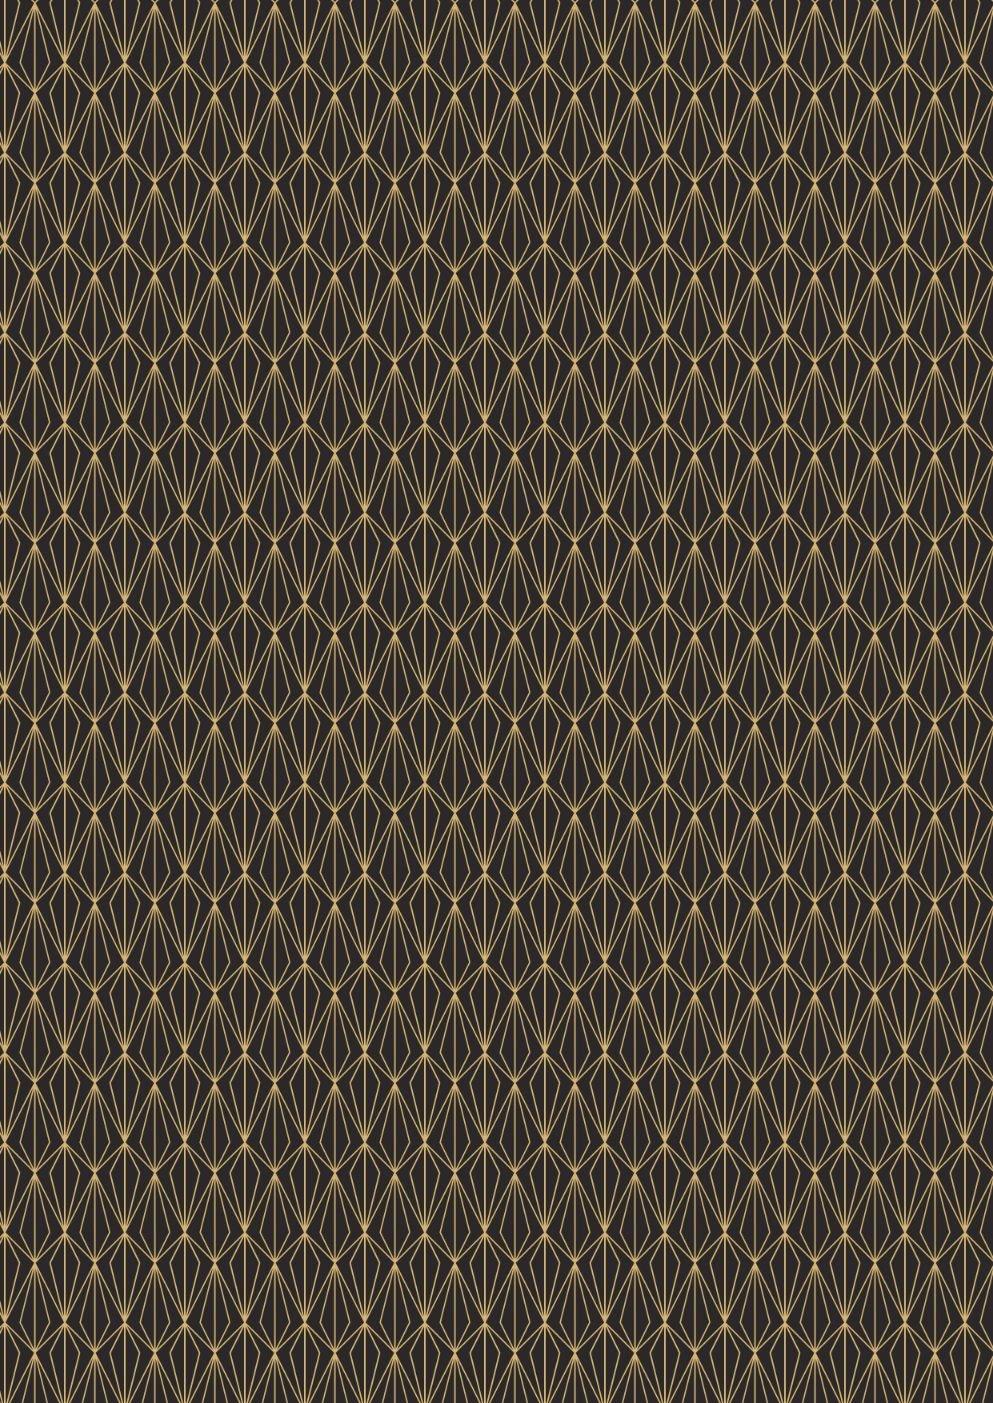 Marvellous Metallics Gold geometric on black